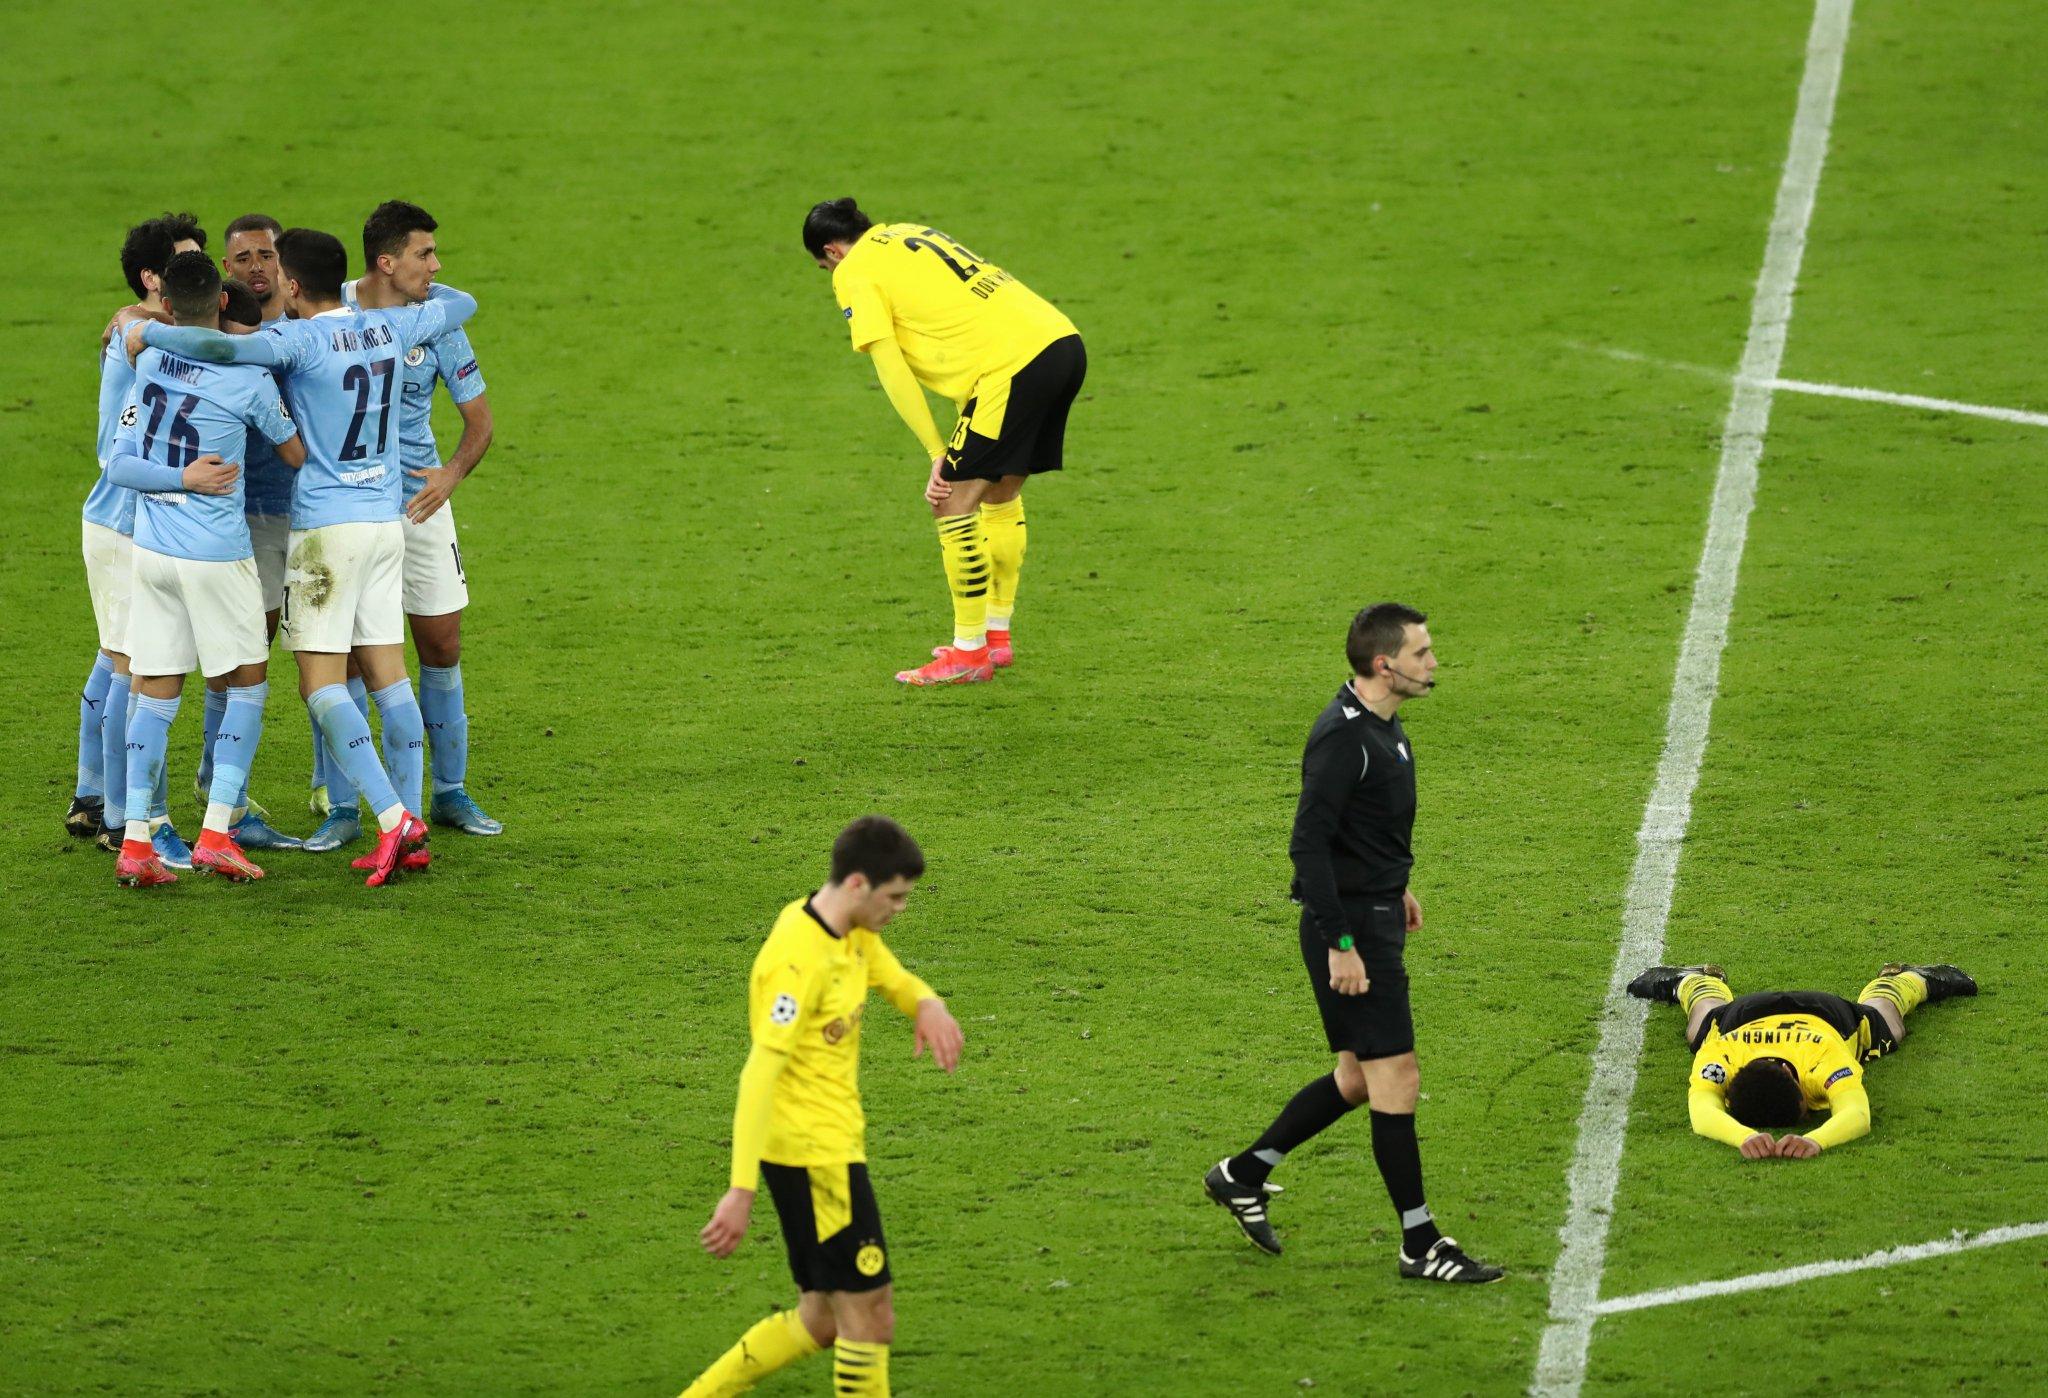 De último minuto, Manchester City derrotó 2-1 al Borussia Dortmund